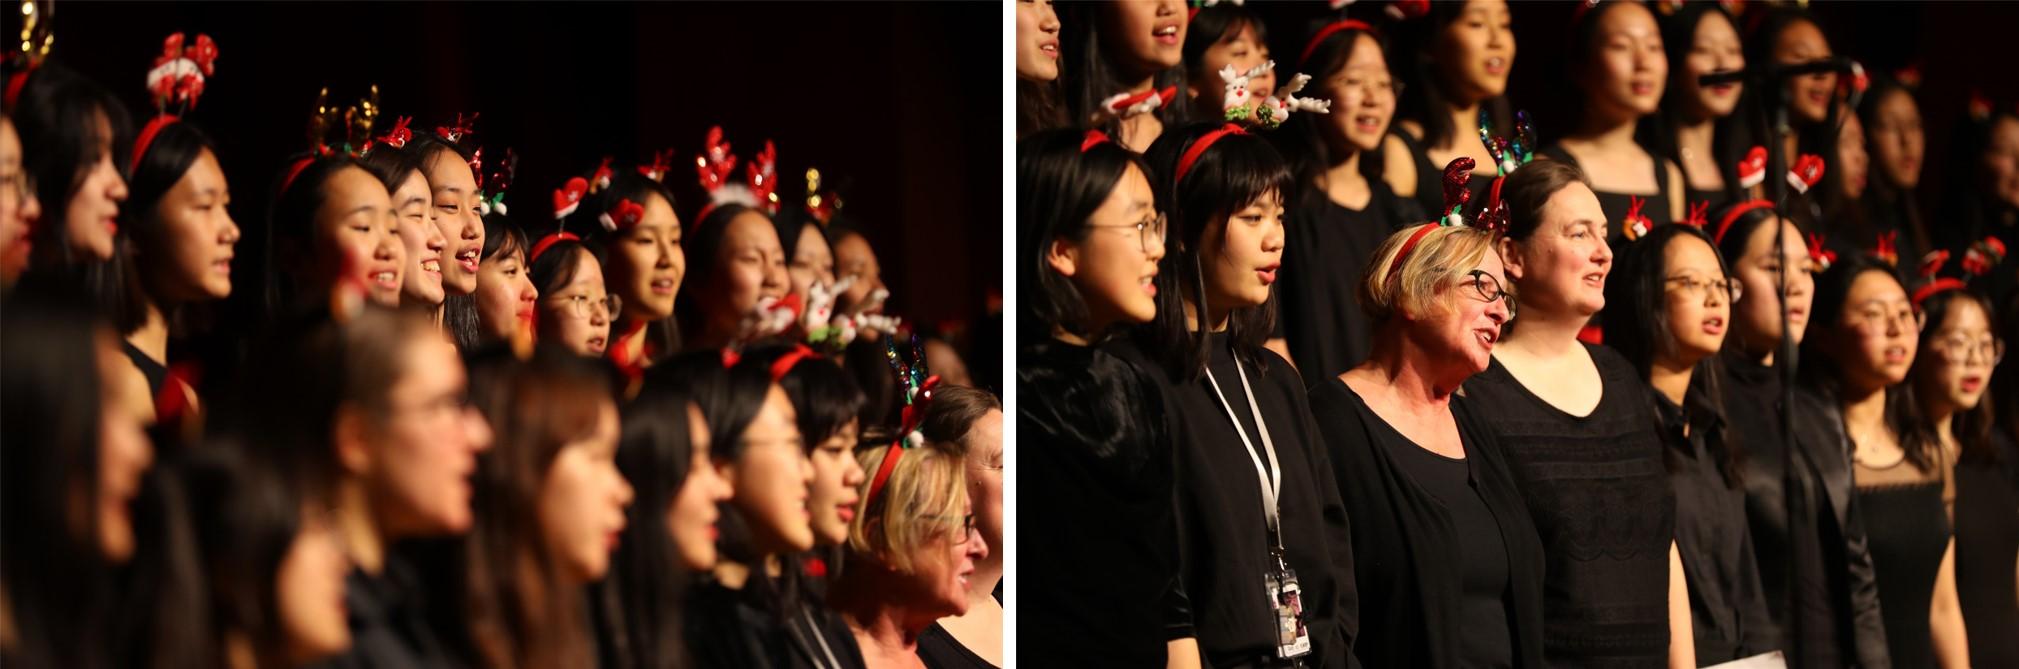 Dulwich Beijing Christmas Concert 2019 - Senior School